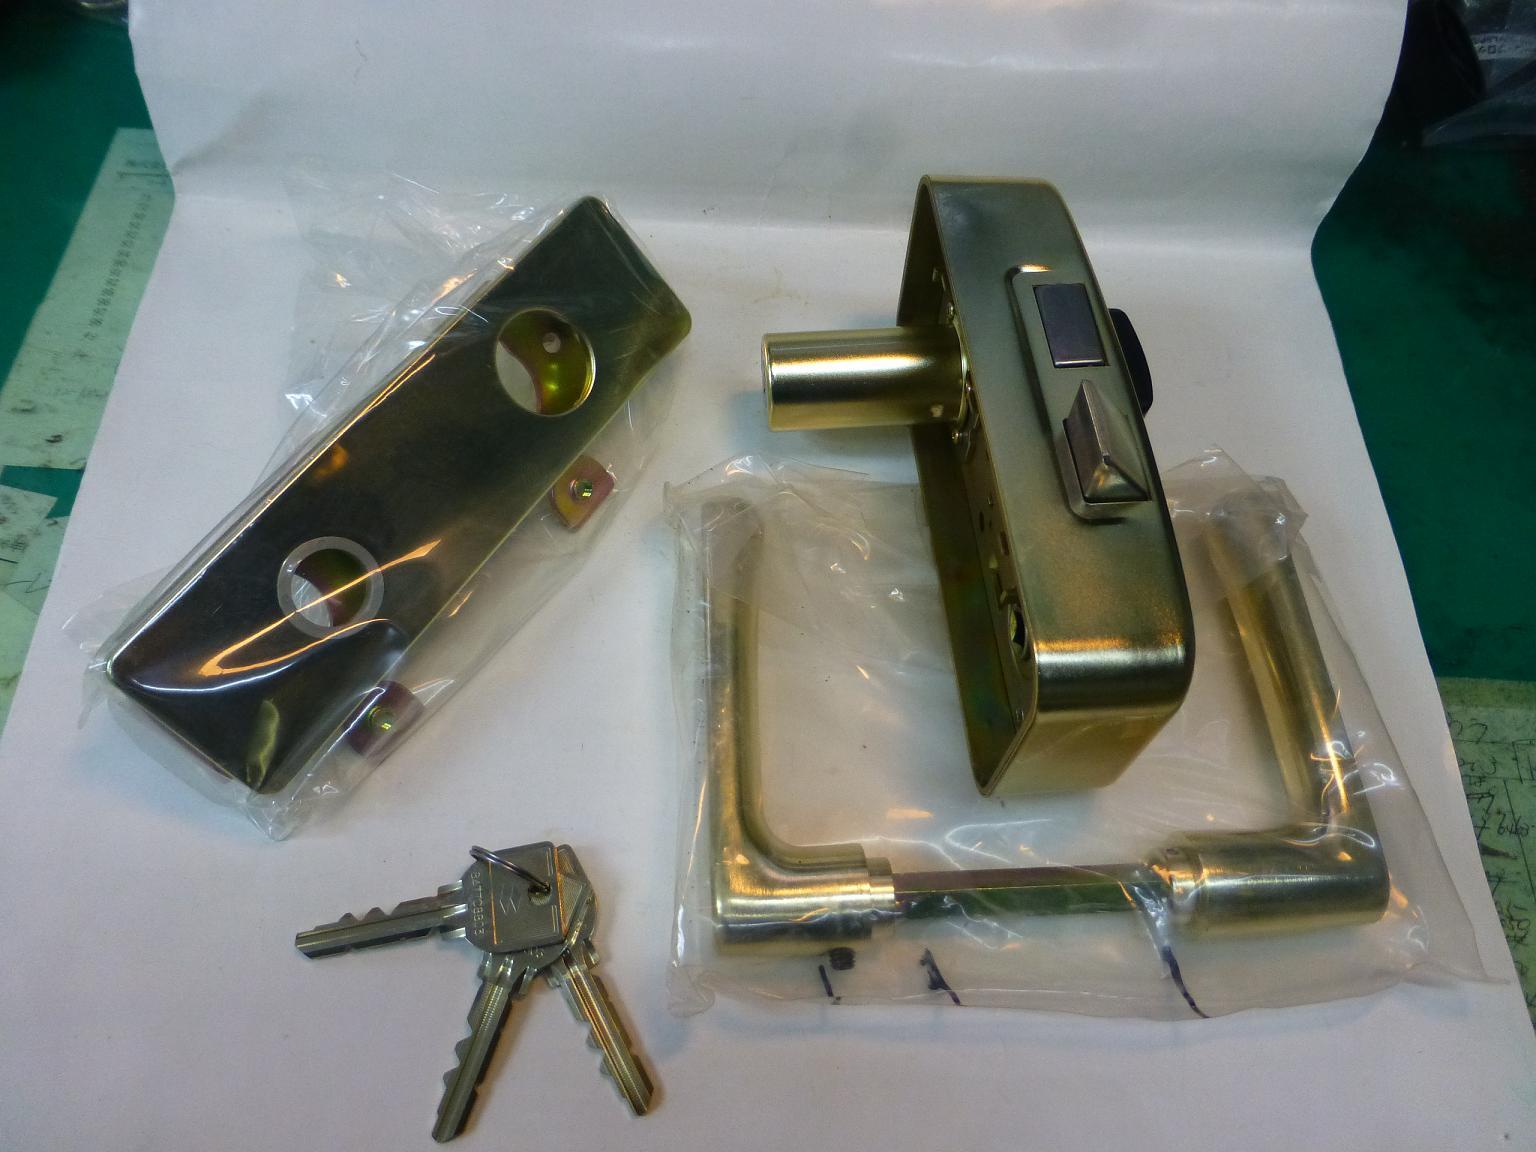 85RAと打刻 MIWA 本締り錠 レバーハンドル U9RAHPC-XB SALENEW大人気 全商品オープニング価格 GD ゴールド 左